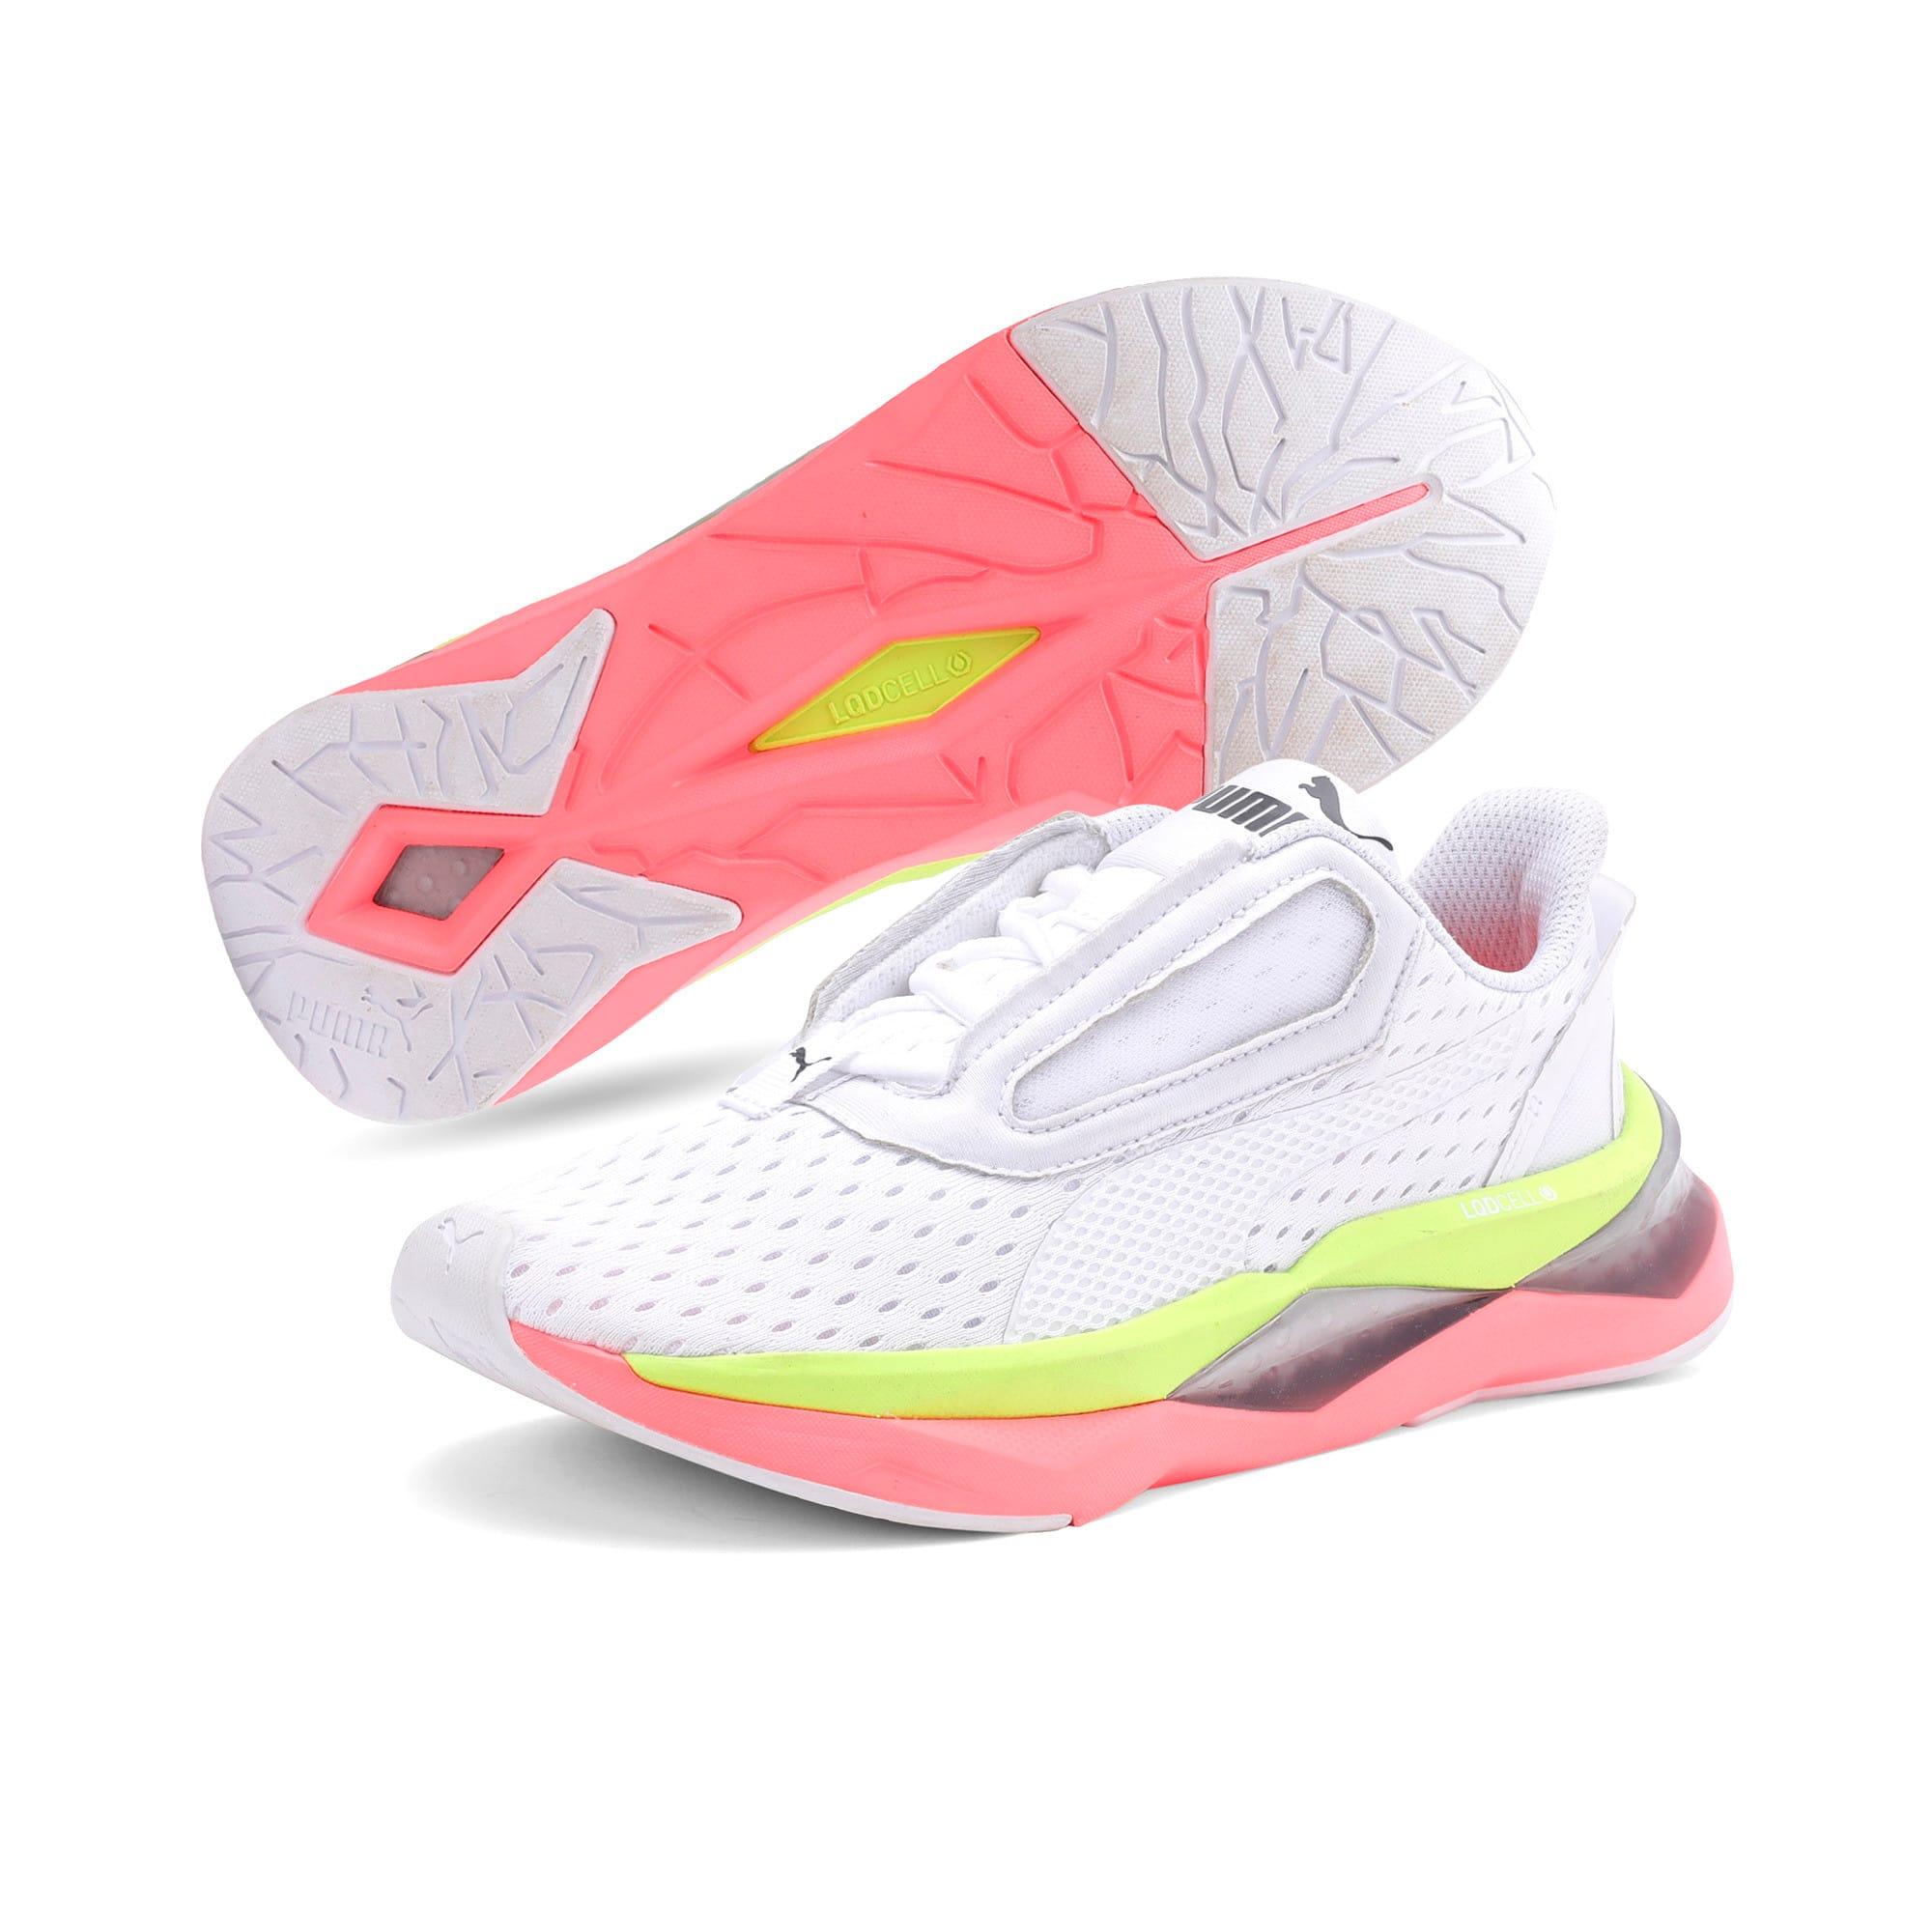 Thumbnail 4 of LQDCell Shatter XT Women's Training Shoes, Puma White-Pink Alert, medium-IND